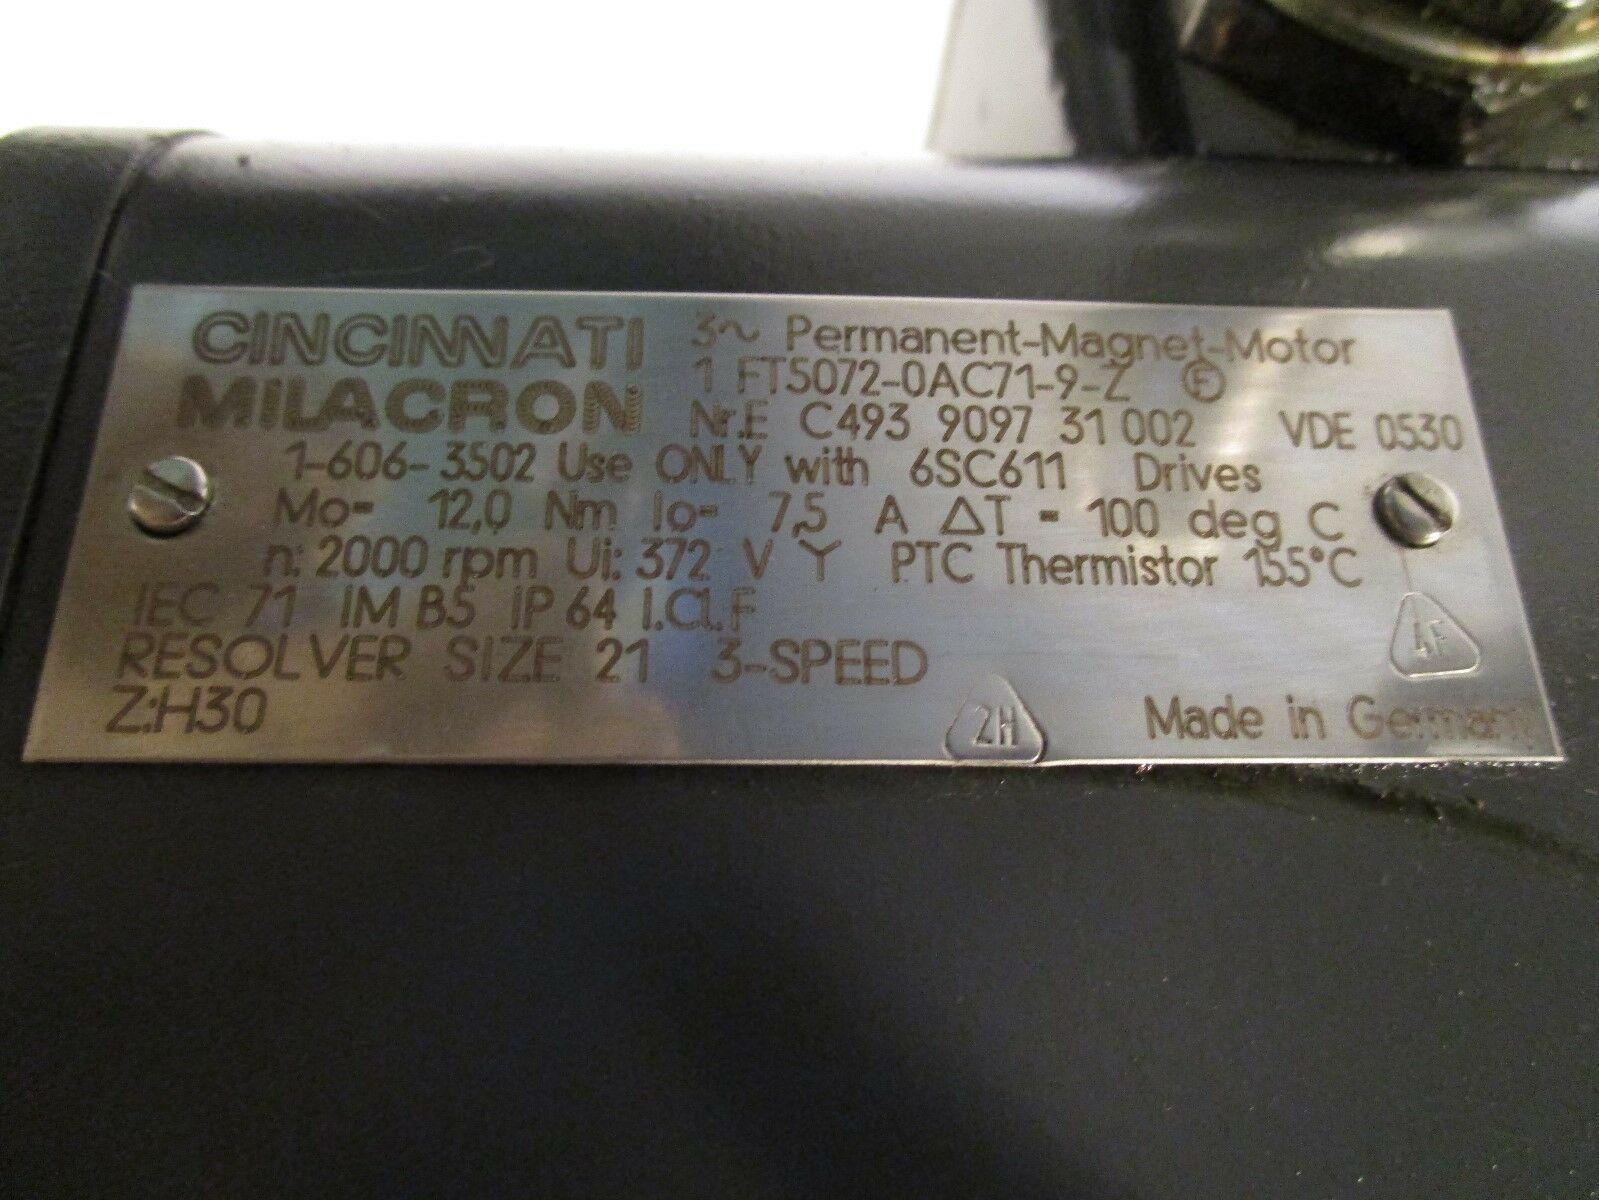 Siemens AC Servo Motor 1FT5072-0AC71-9-Z CMI Part# 1-606-3502